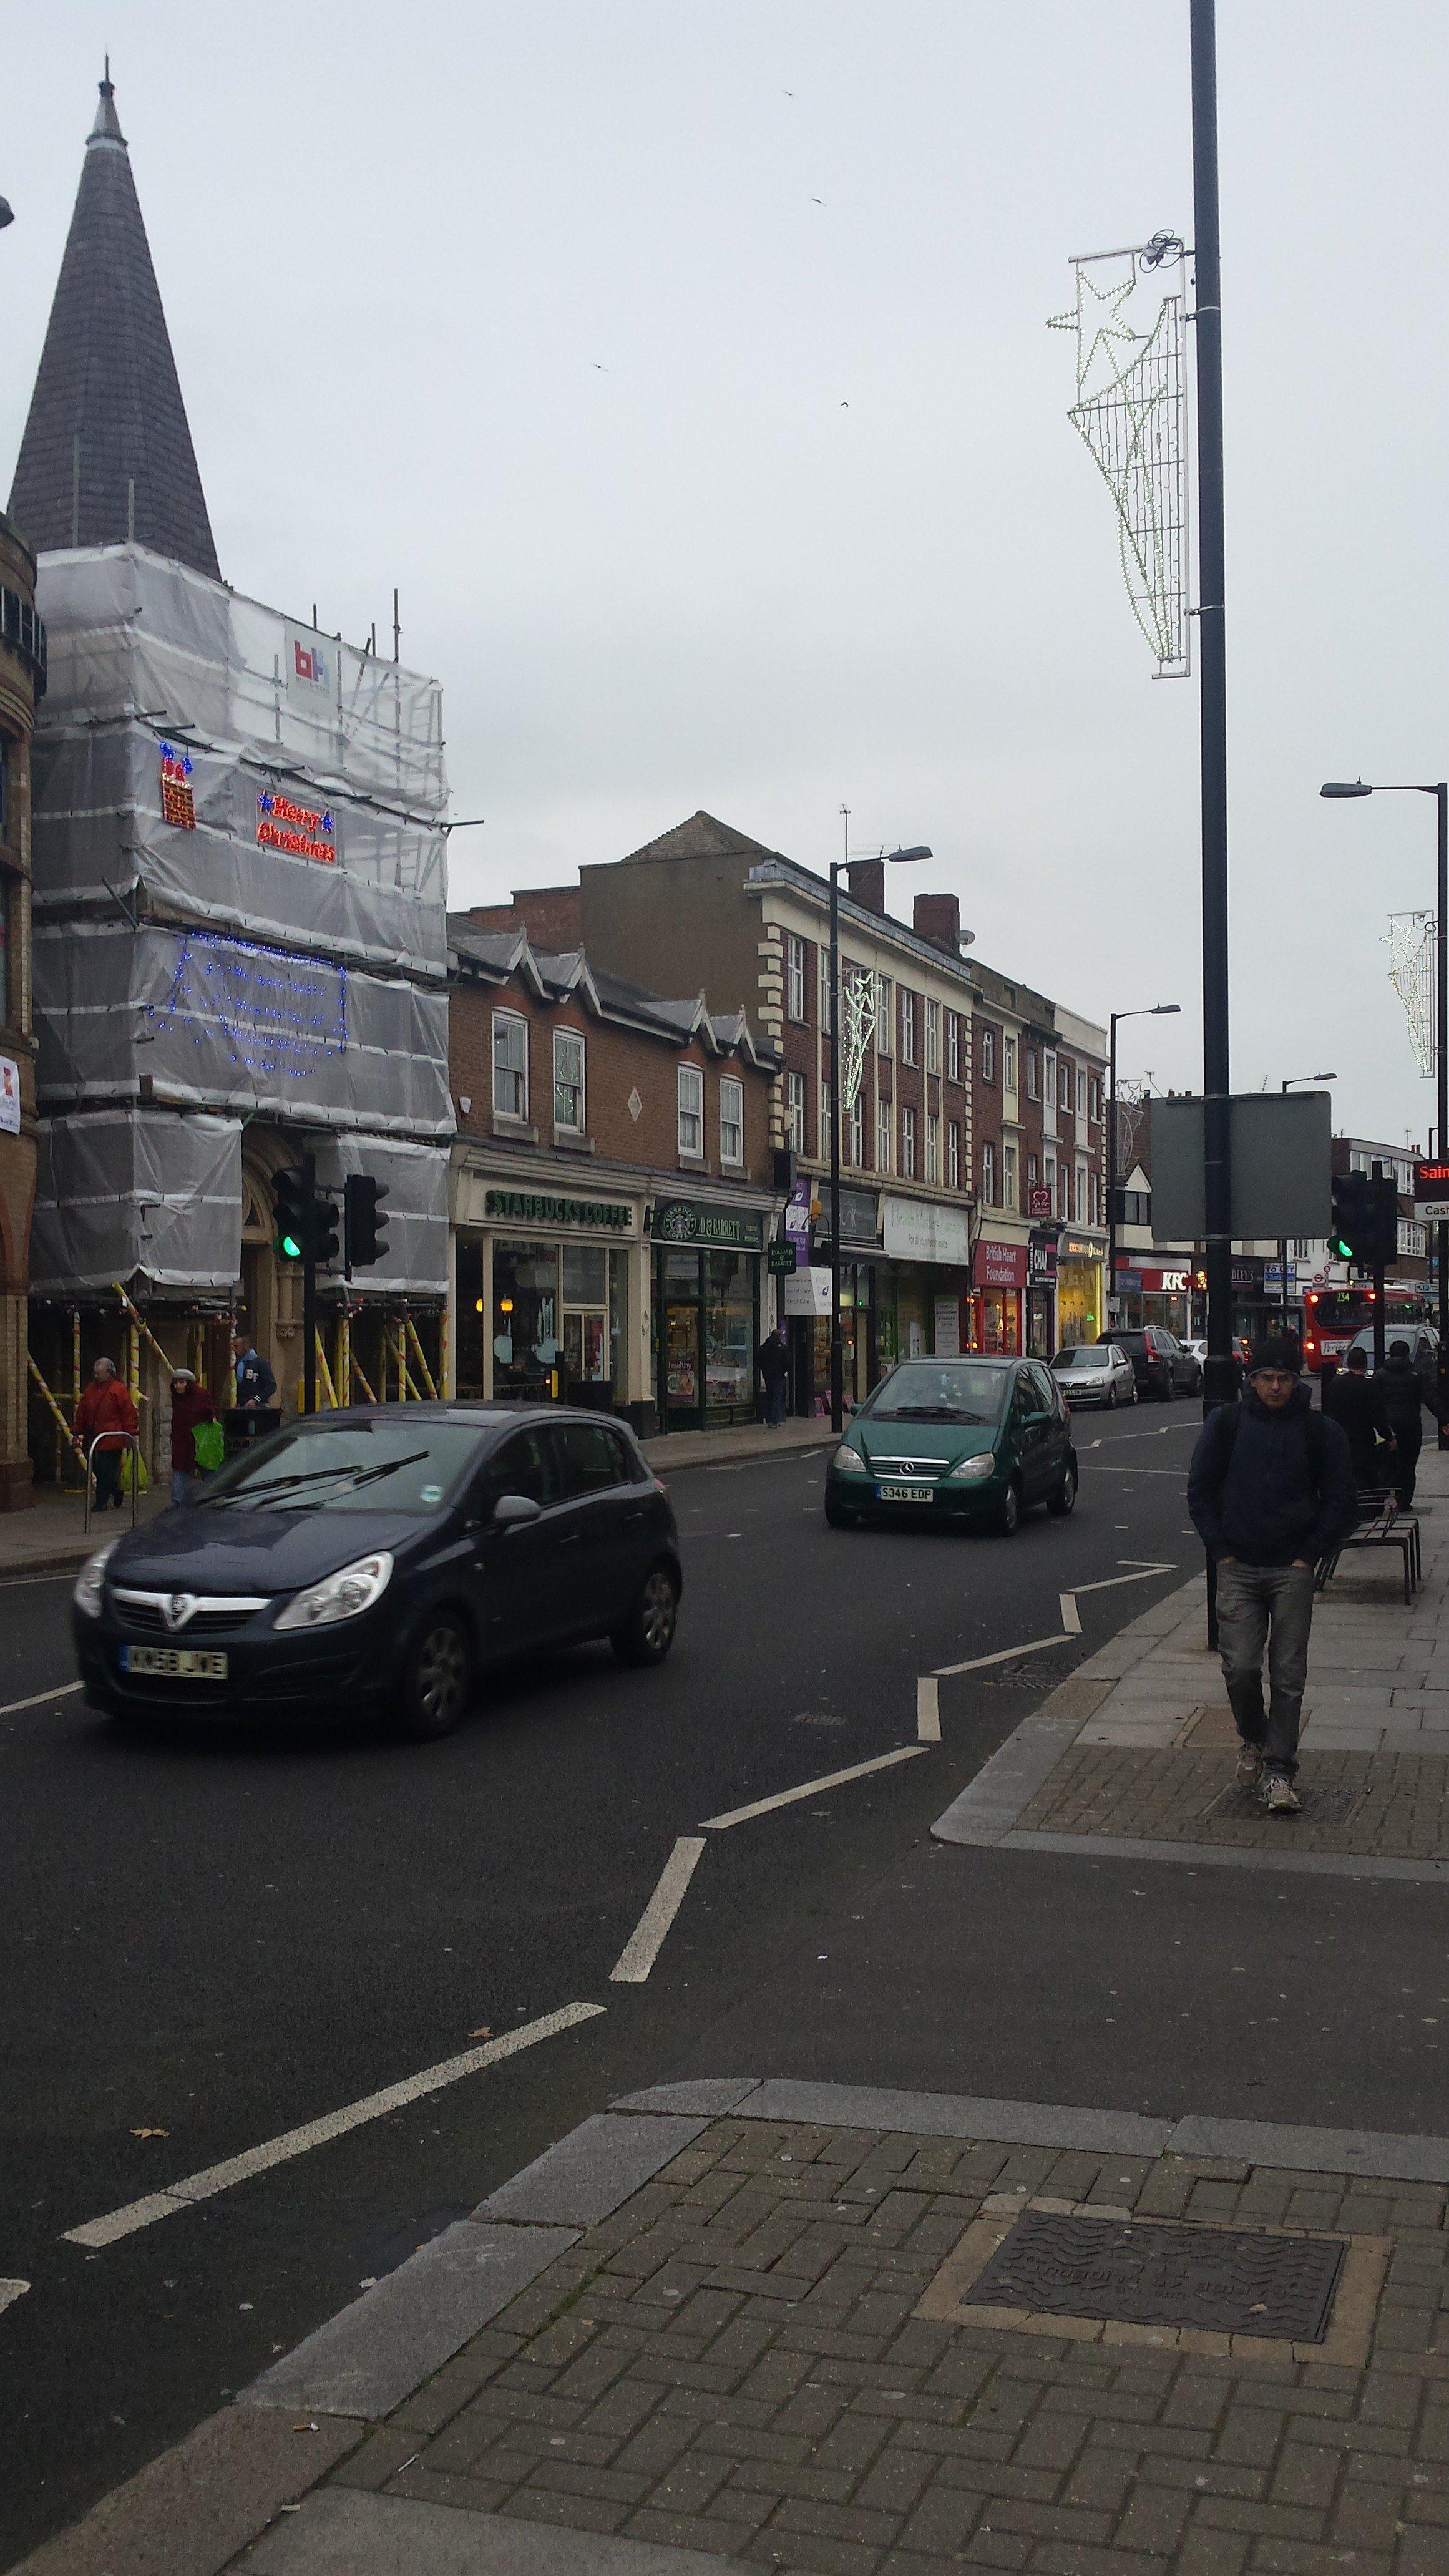 Barnet high street